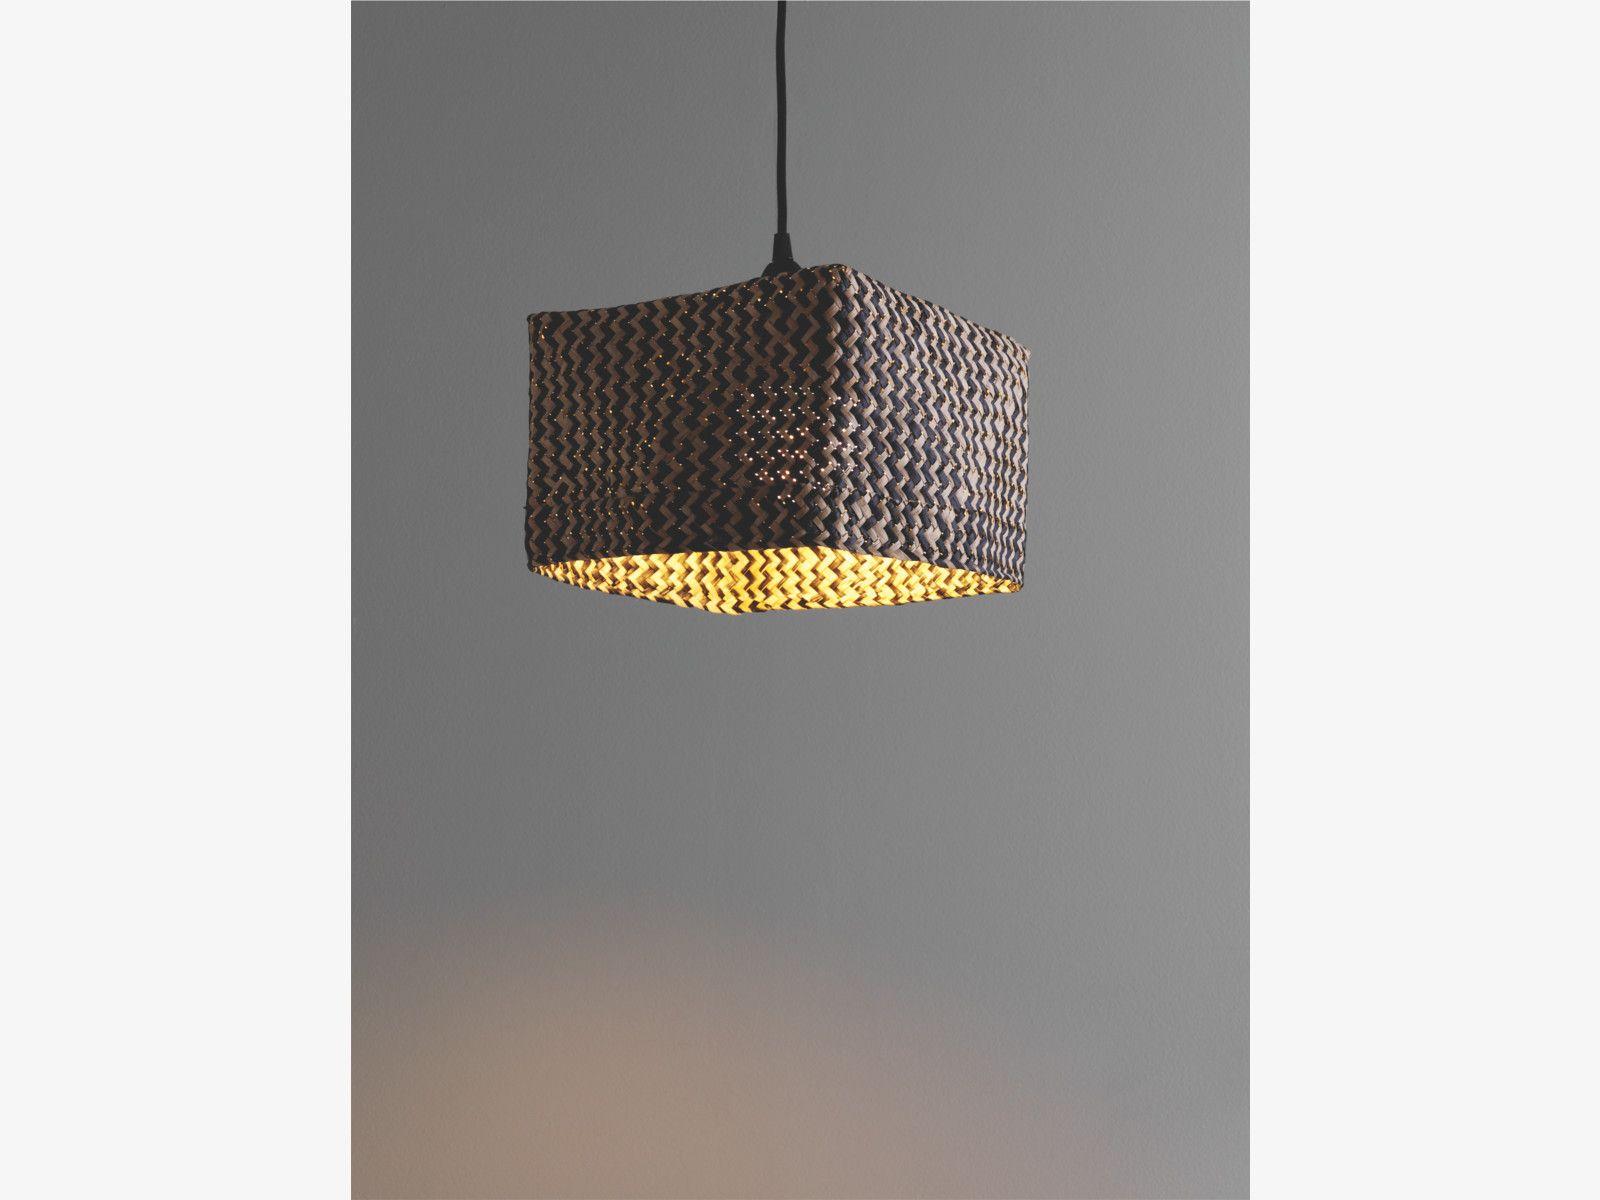 Habitat Light Shades Patterned Lampshades Ceiling Lights